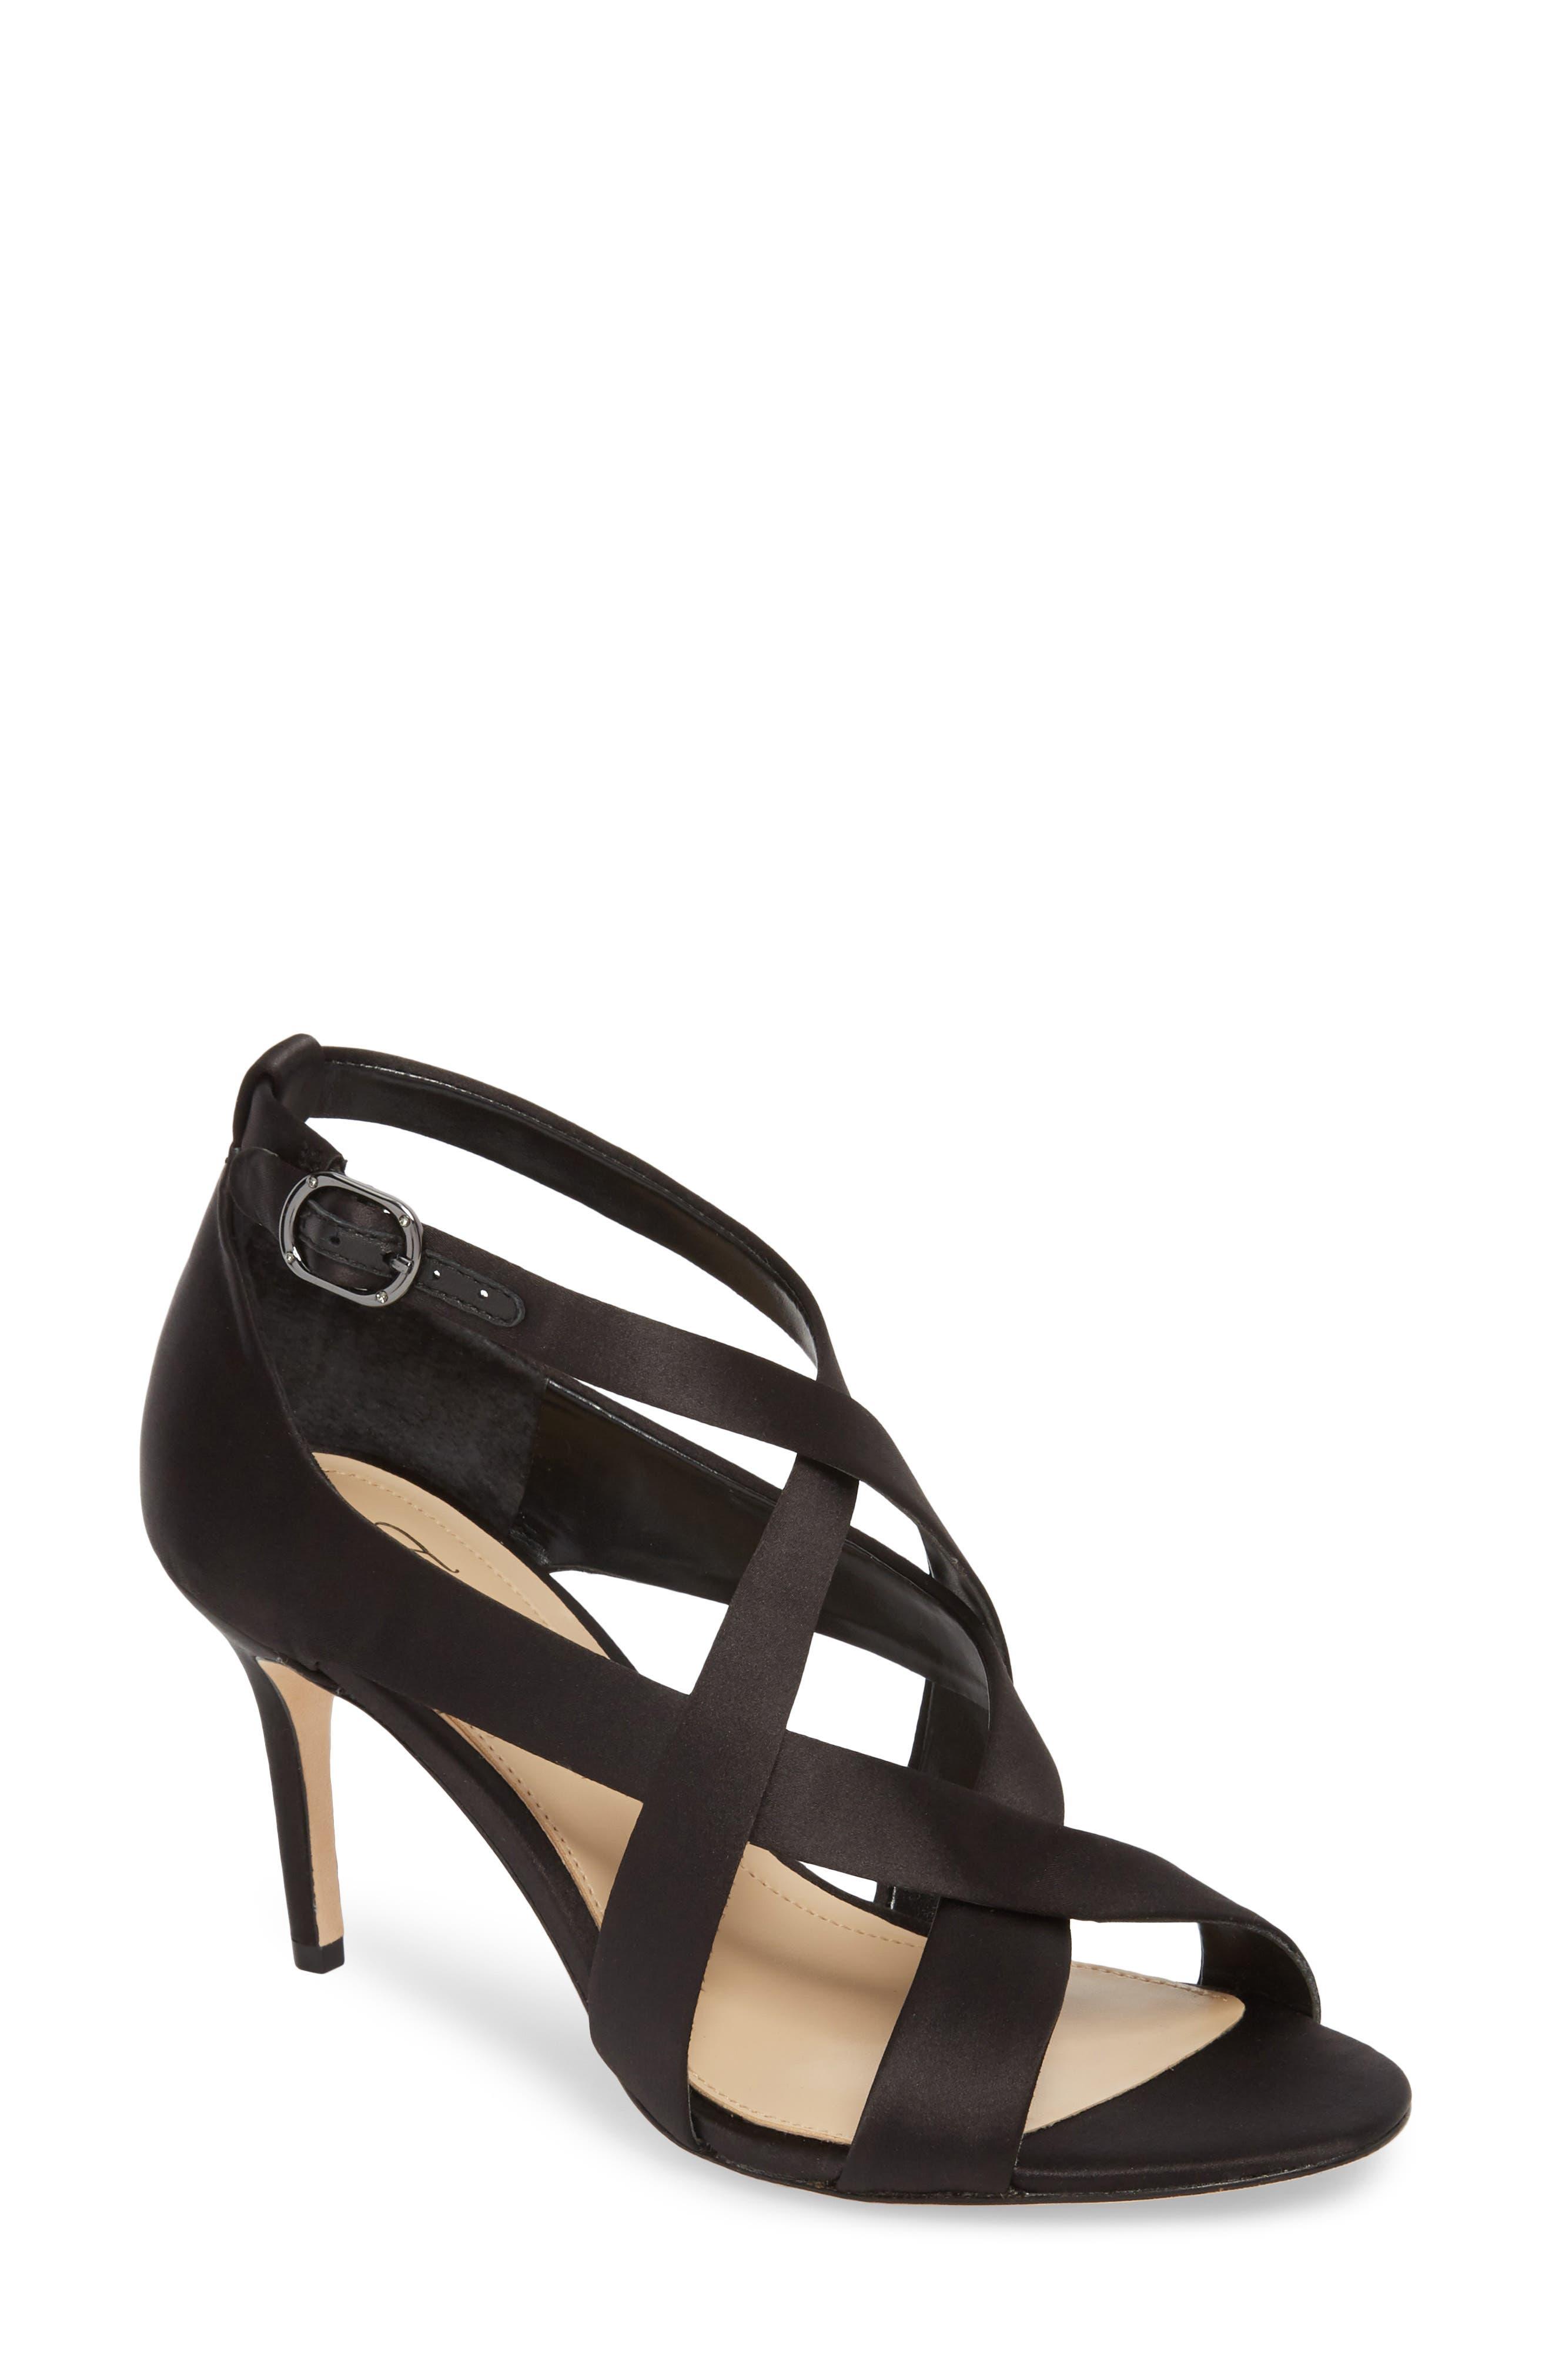 Paill Sandal,                         Main,                         color, BLACK SATIN